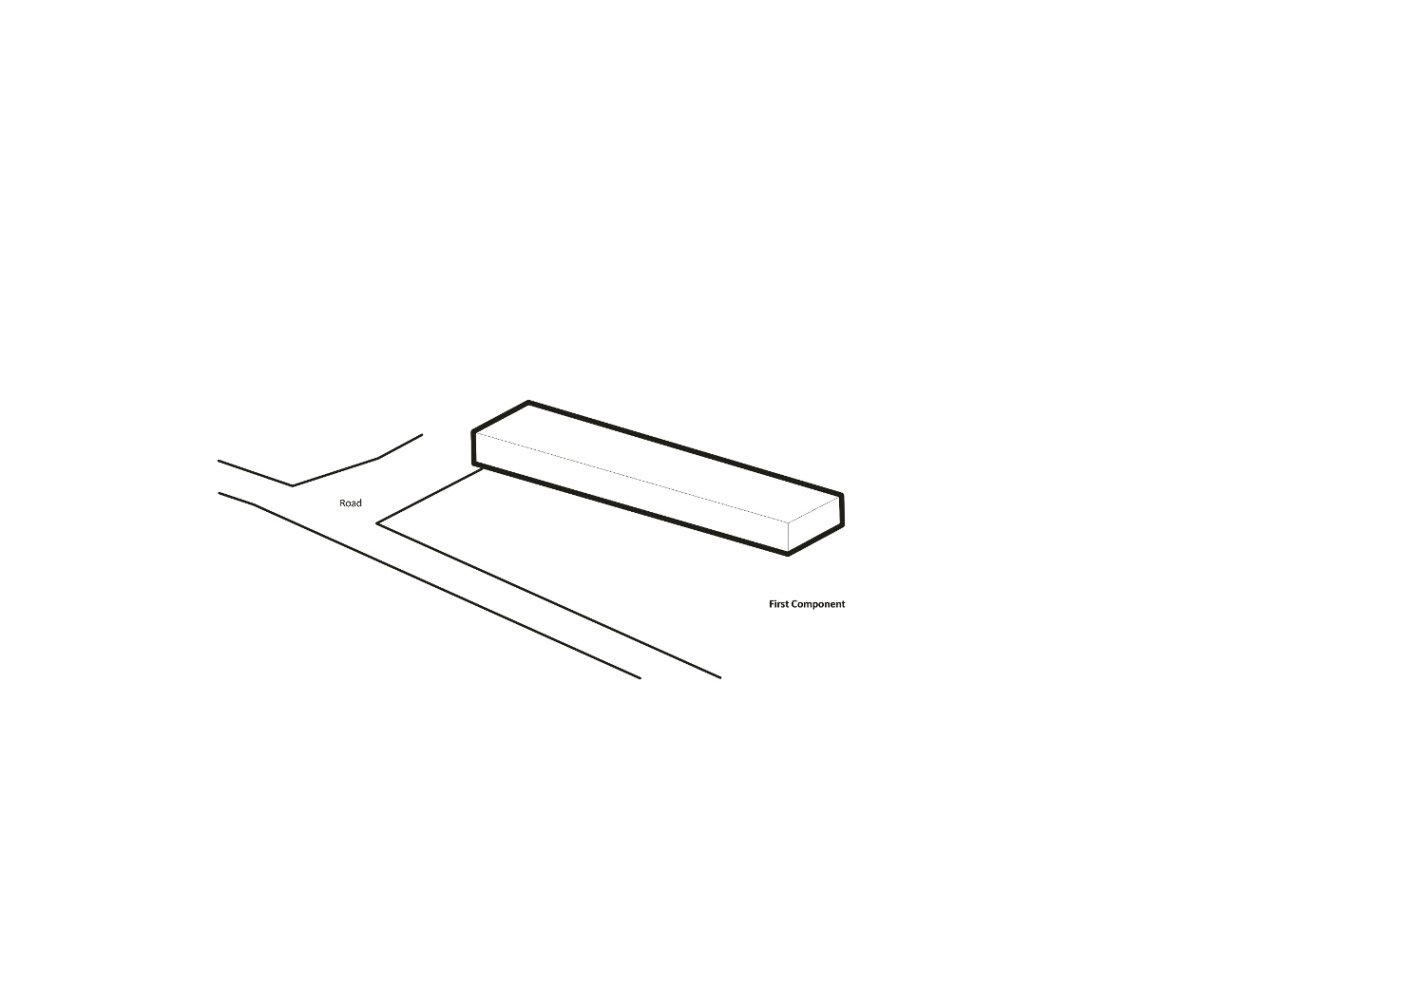 idea diagram 1 Wall Corporation}